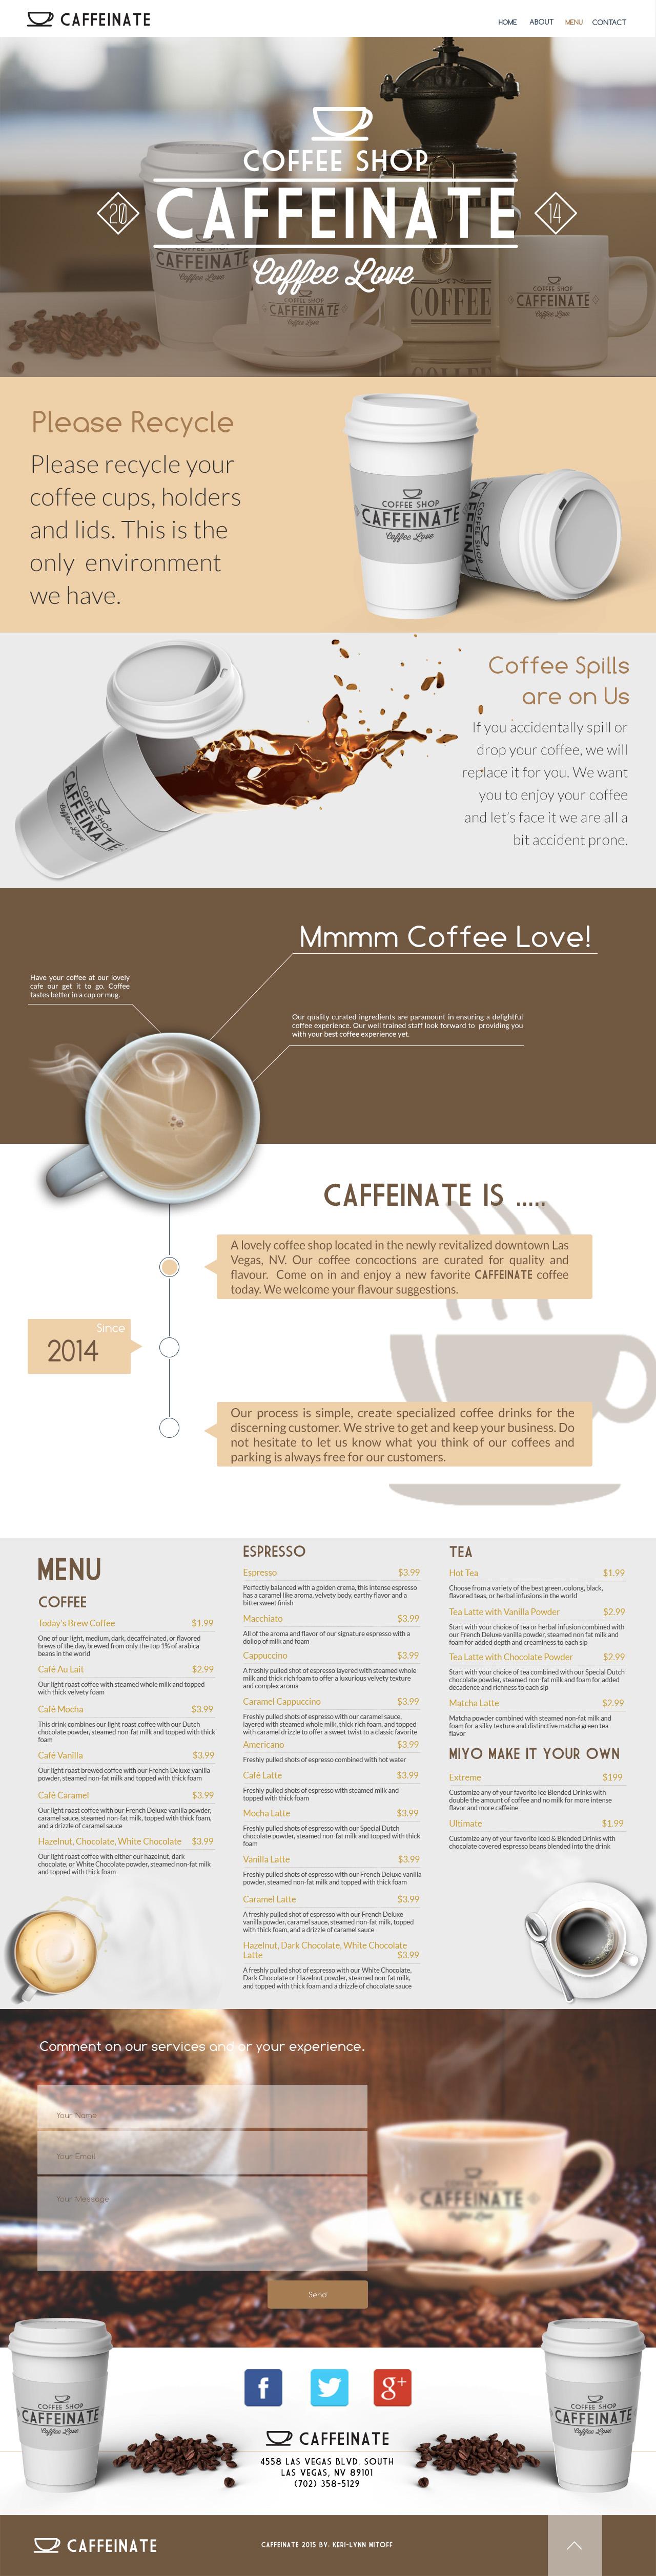 Caffeinate web 02